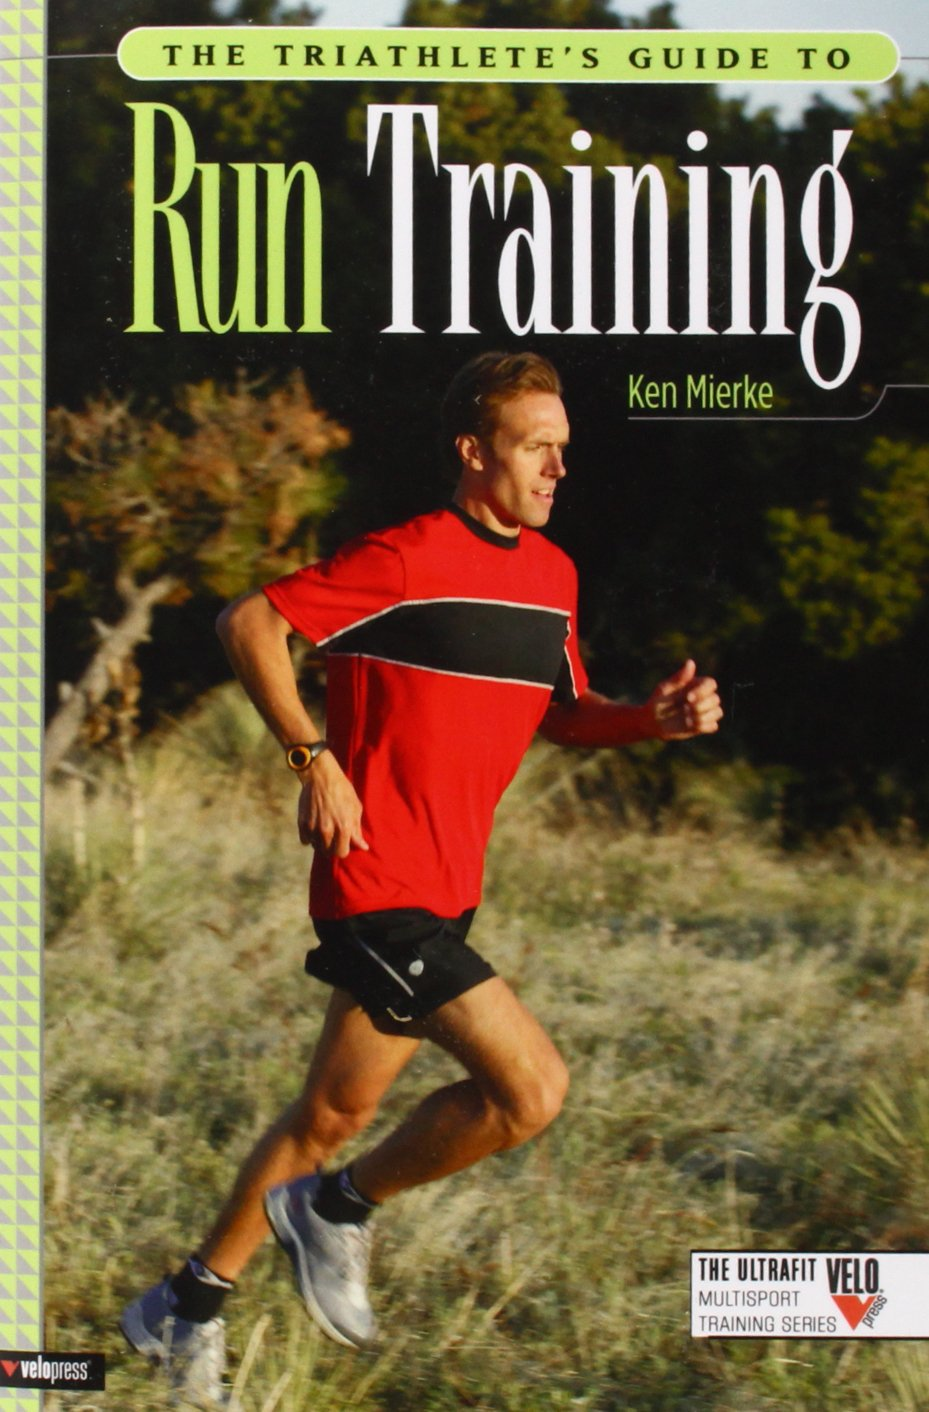 Download The Triathlete's Guide to Run Training (Ultrafit Multisport Training) ePub fb2 book